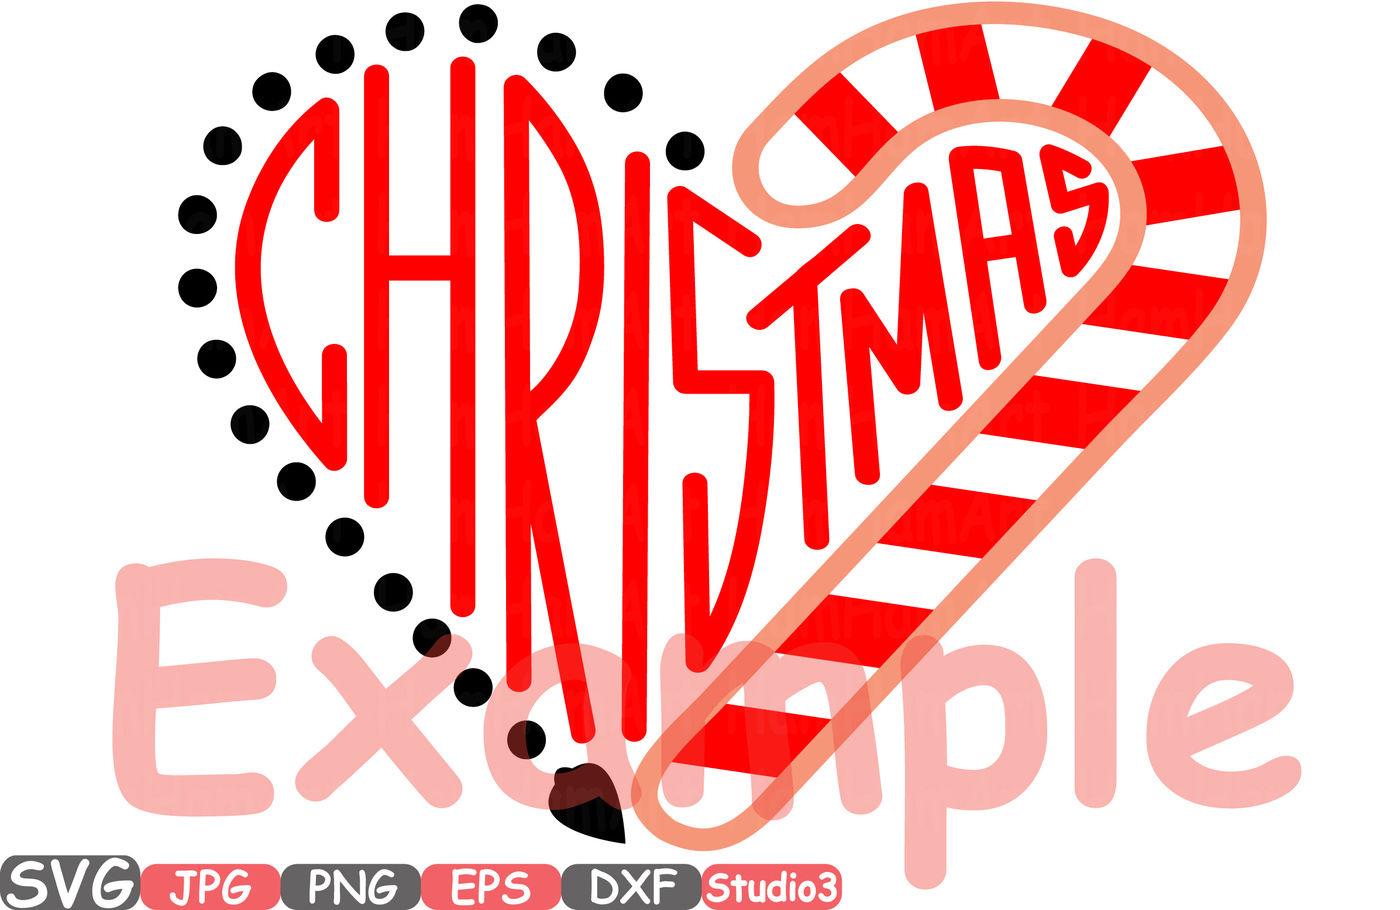 Christmas Heart Monogram Silhouette Svg Cutting Files Digital Clip Art Graphic Studio3 Cricut Cuttable Die Cut Machines Santa S Magic Love Holiday Winter 63sv By Hamhamart Thehungryjpeg Com